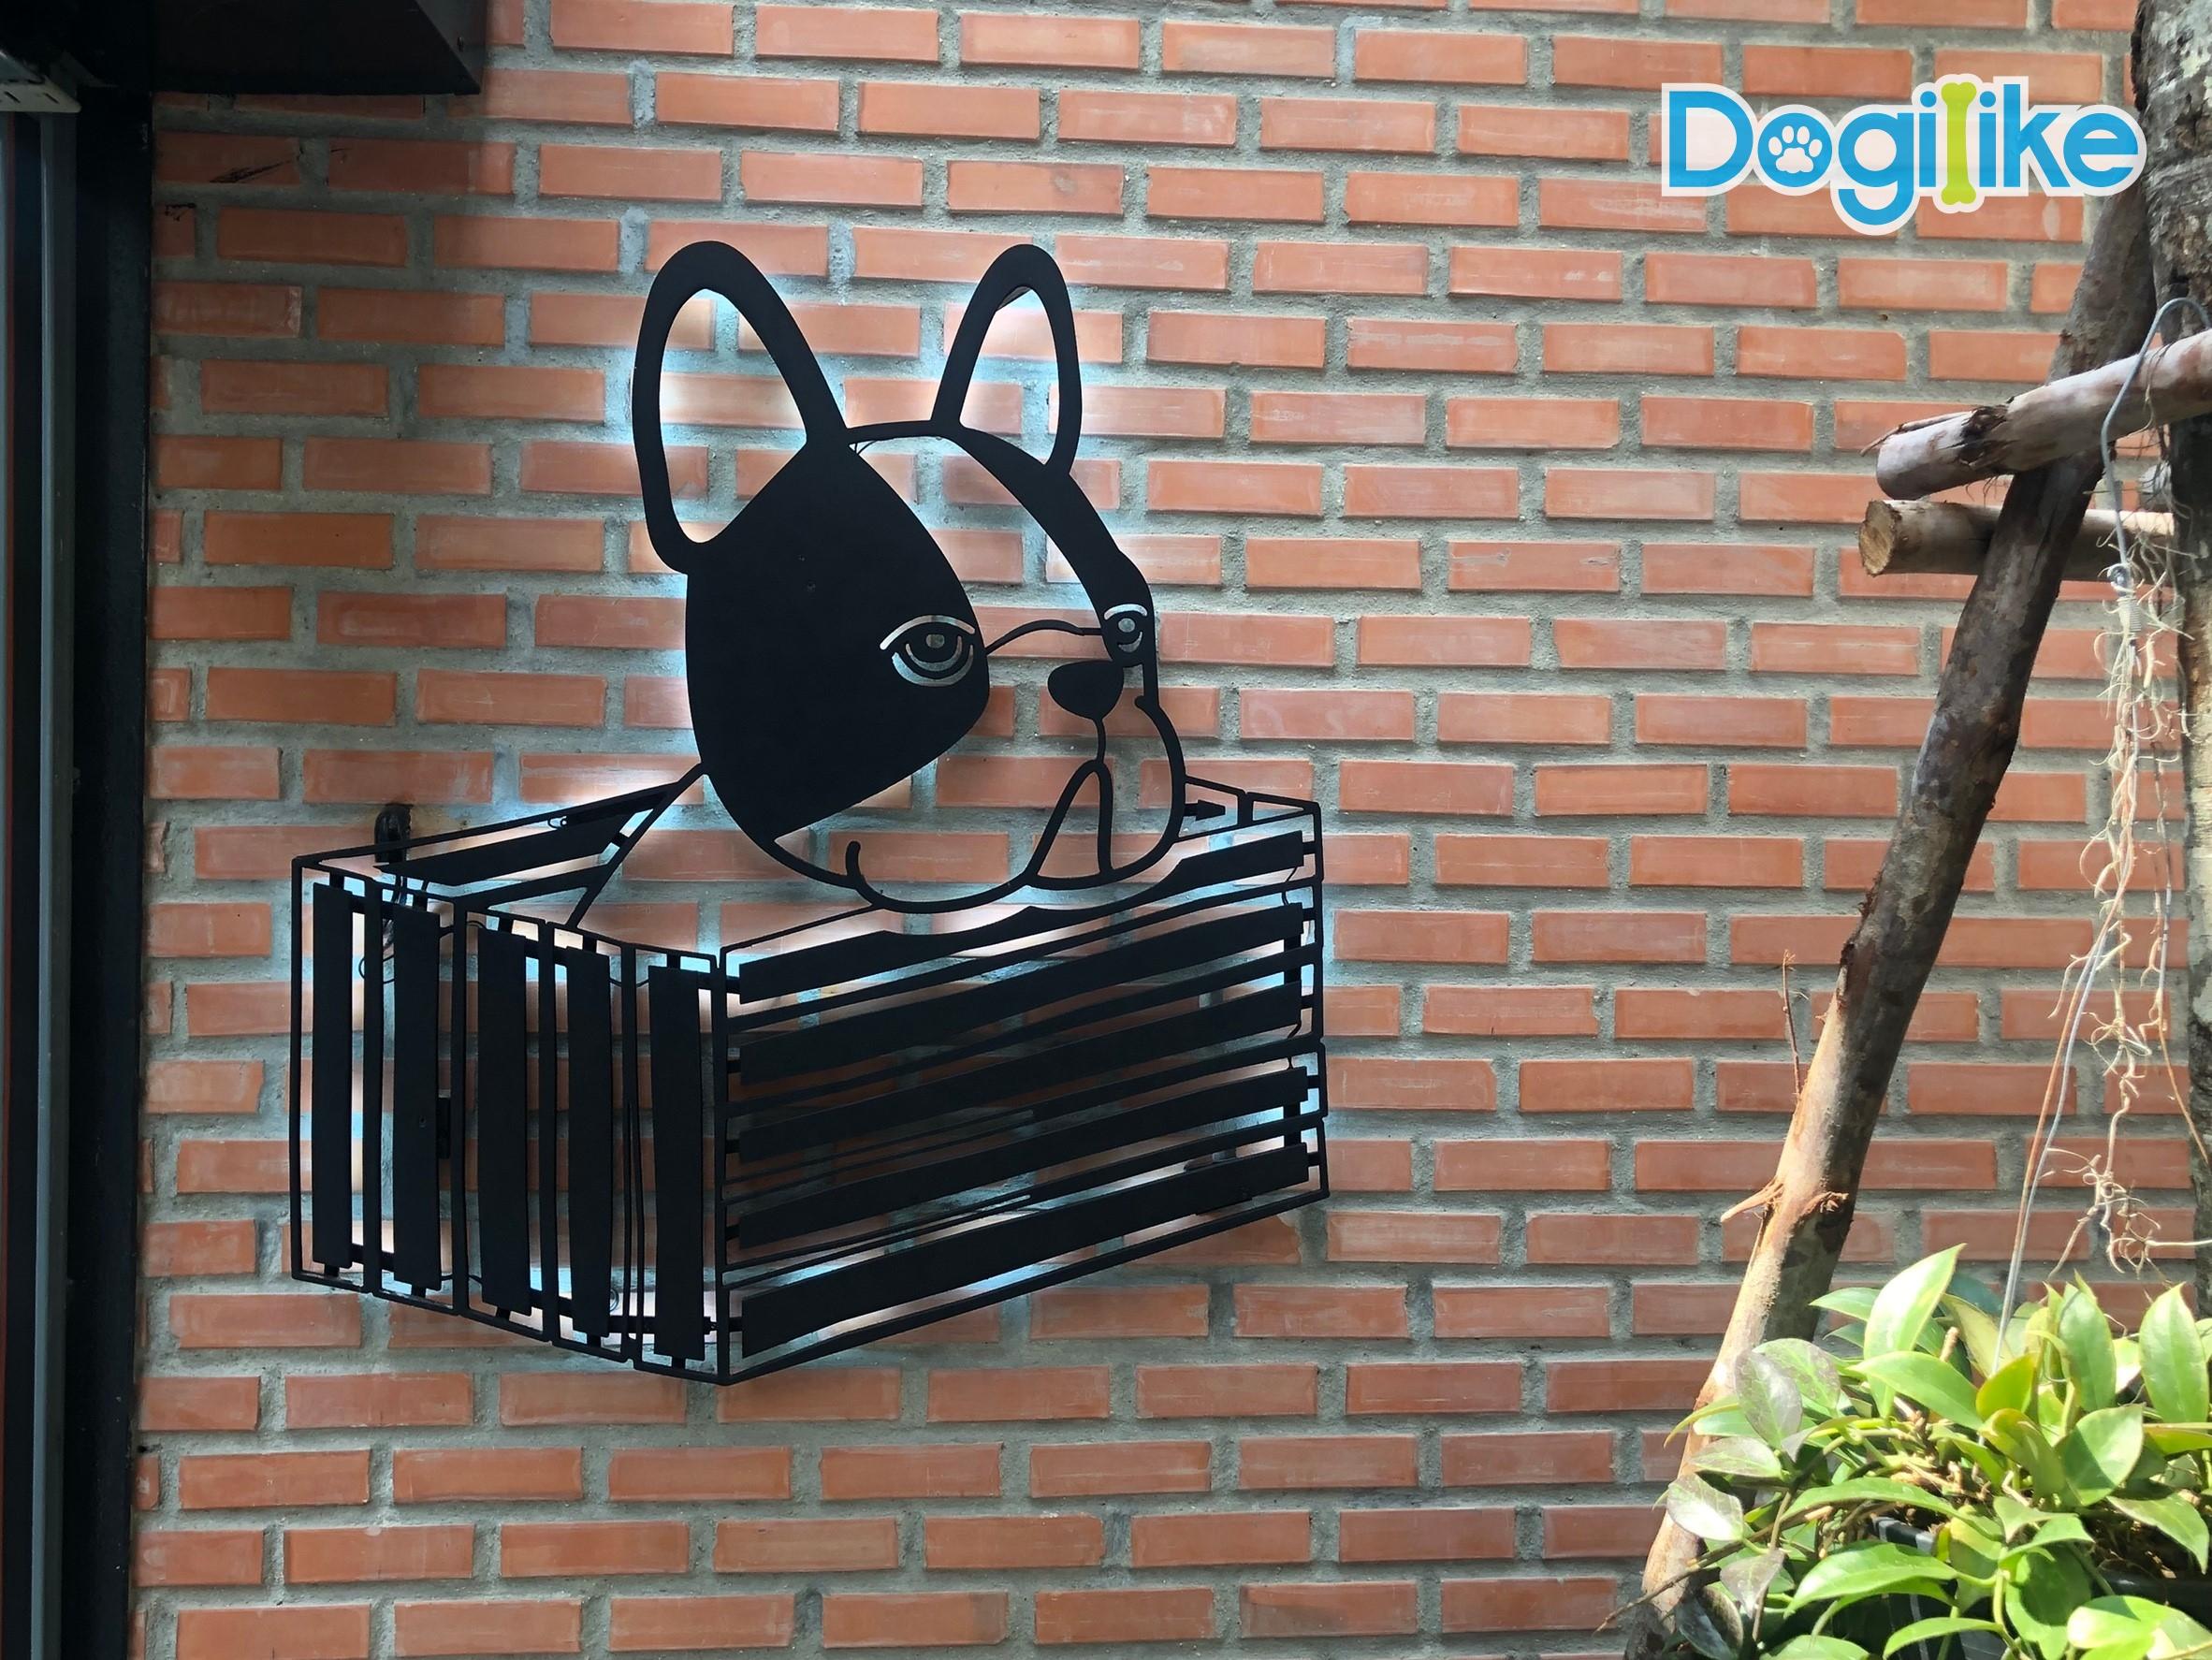 Dogilike.com :: Dogilike Review : Bok Box Bkk ร้านธีมน้องหมาน่ารัก บรรยากาศดีสุด ๆ (ใกล้BTS)